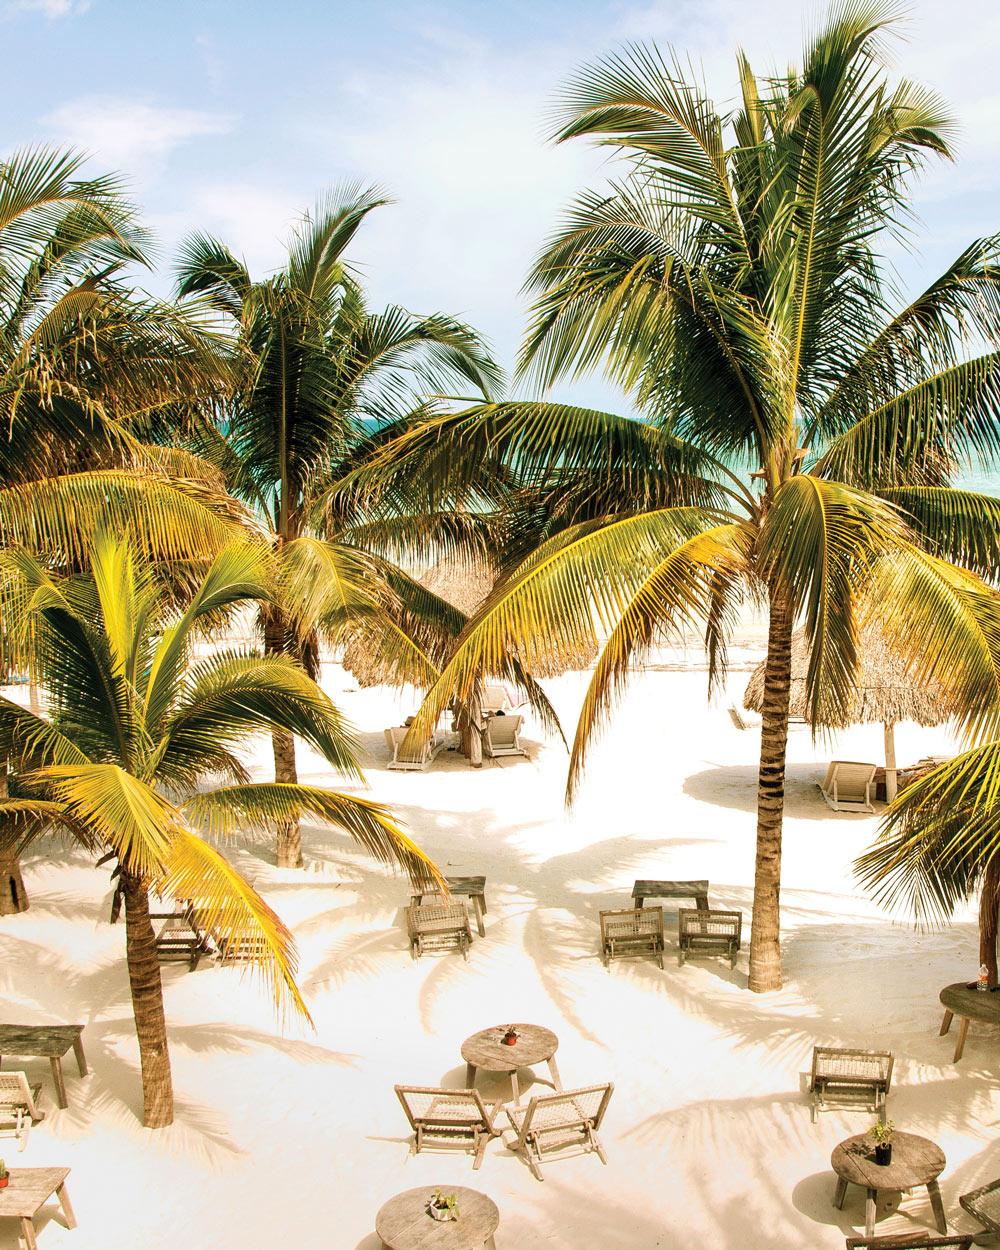 travel-new-places-beach-casa-las-tortugas-mexico.jpg